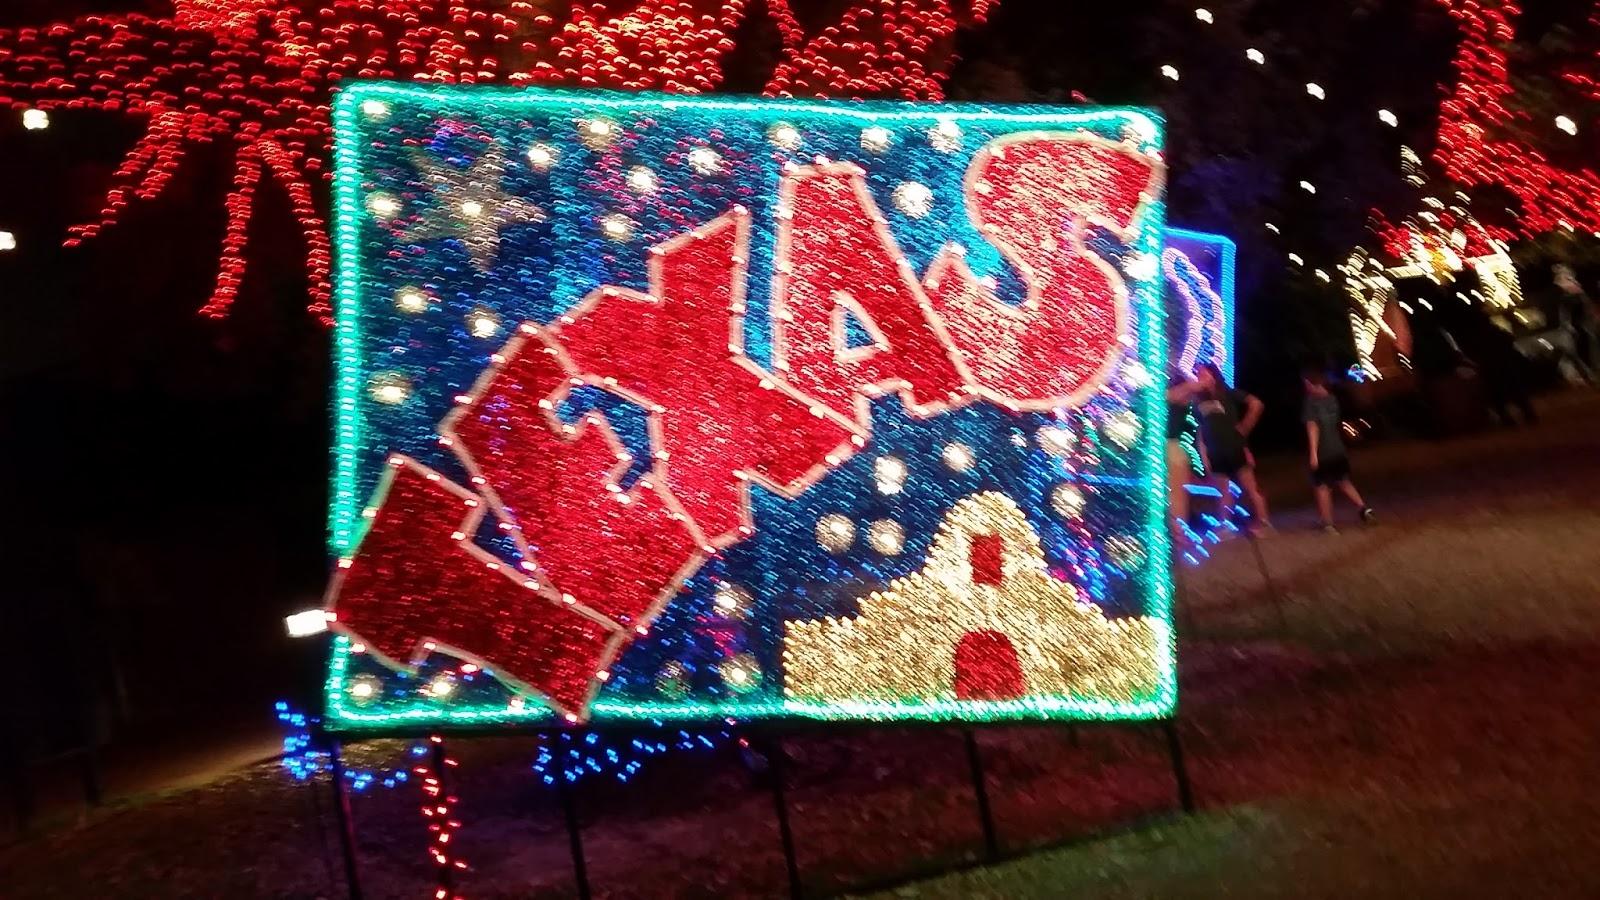 travel tuesday houston zoo lights 2015 - Christmas In Houston 2015